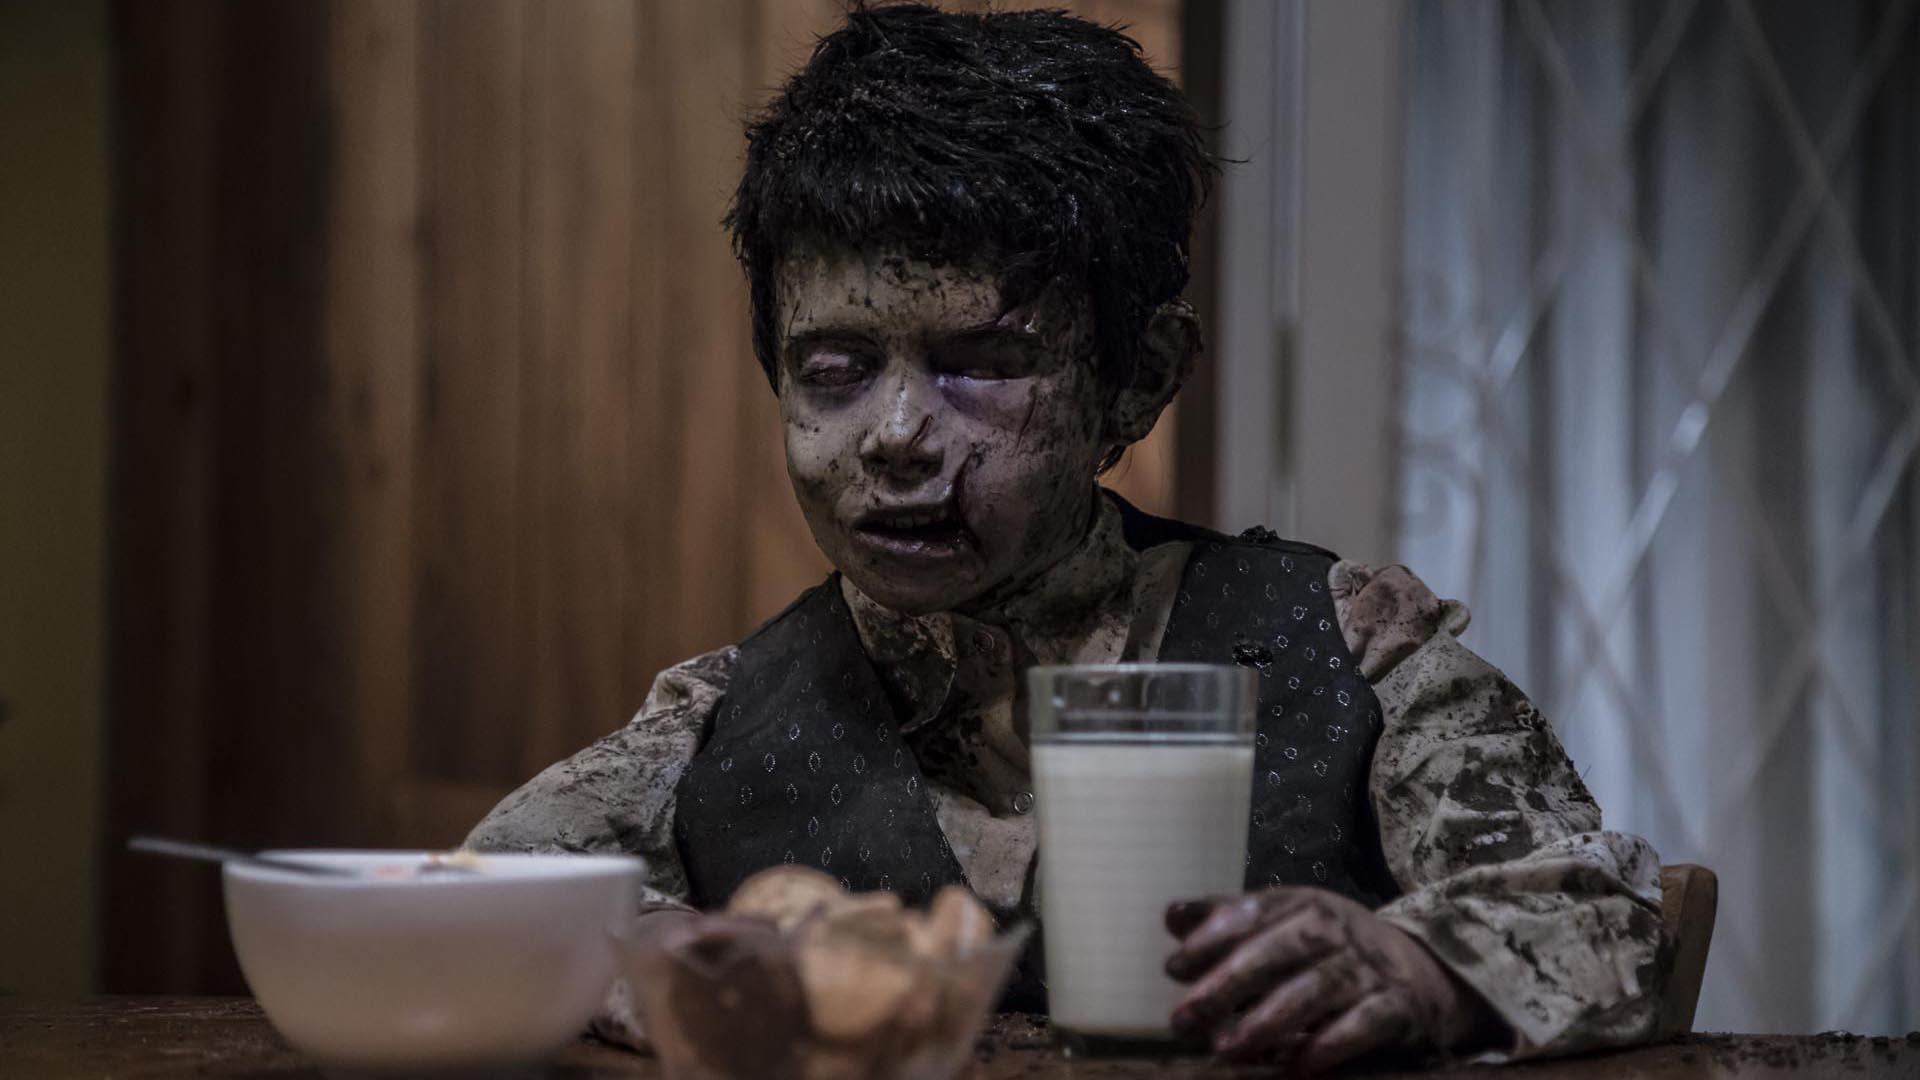 ESPECIAL: 15 escalofriantes películas de terror sobrenatural para ver en Netflix